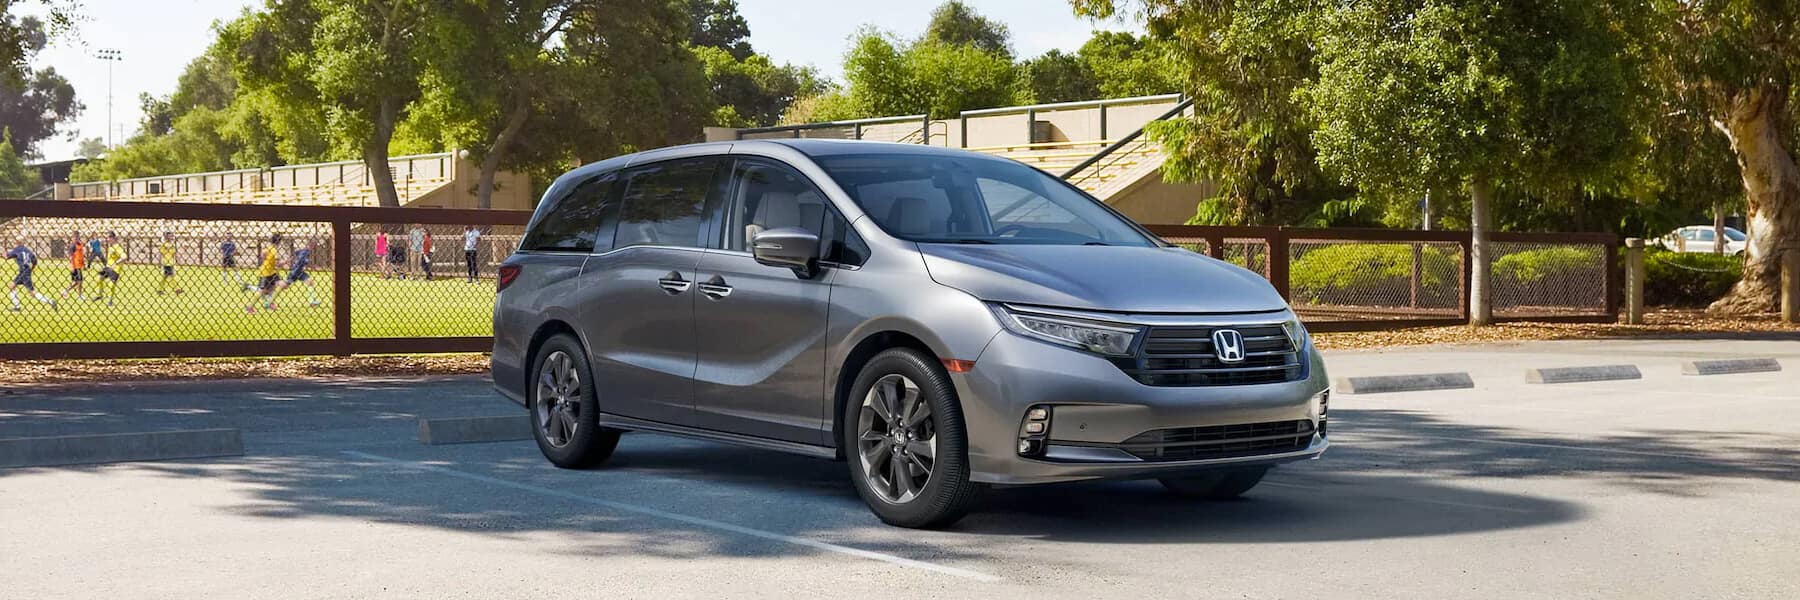 2022 Honda Odyssey Overview